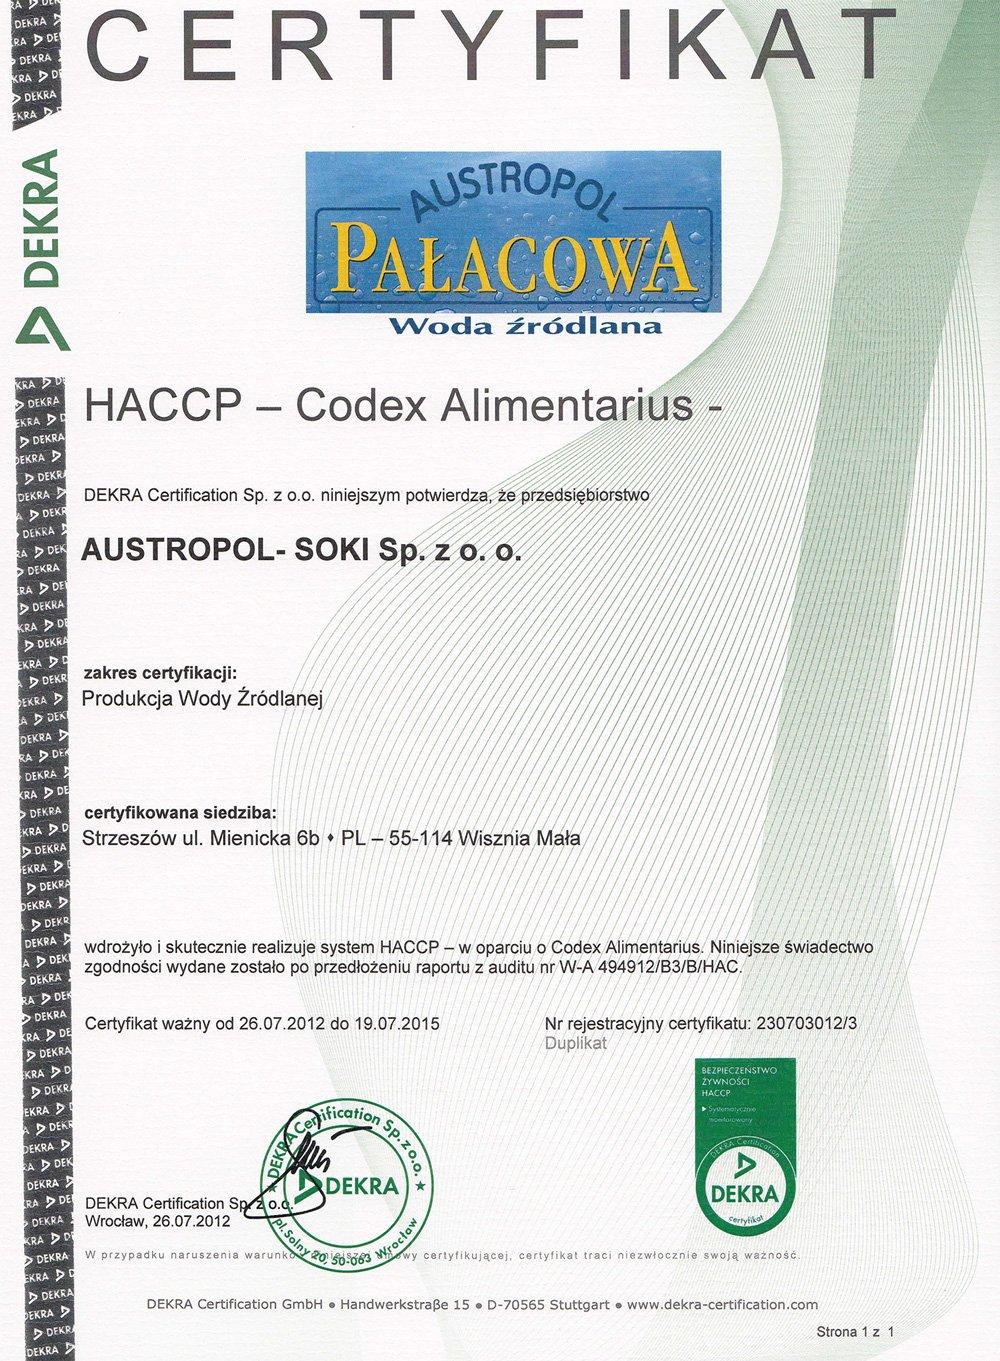 certyfikat-haccp